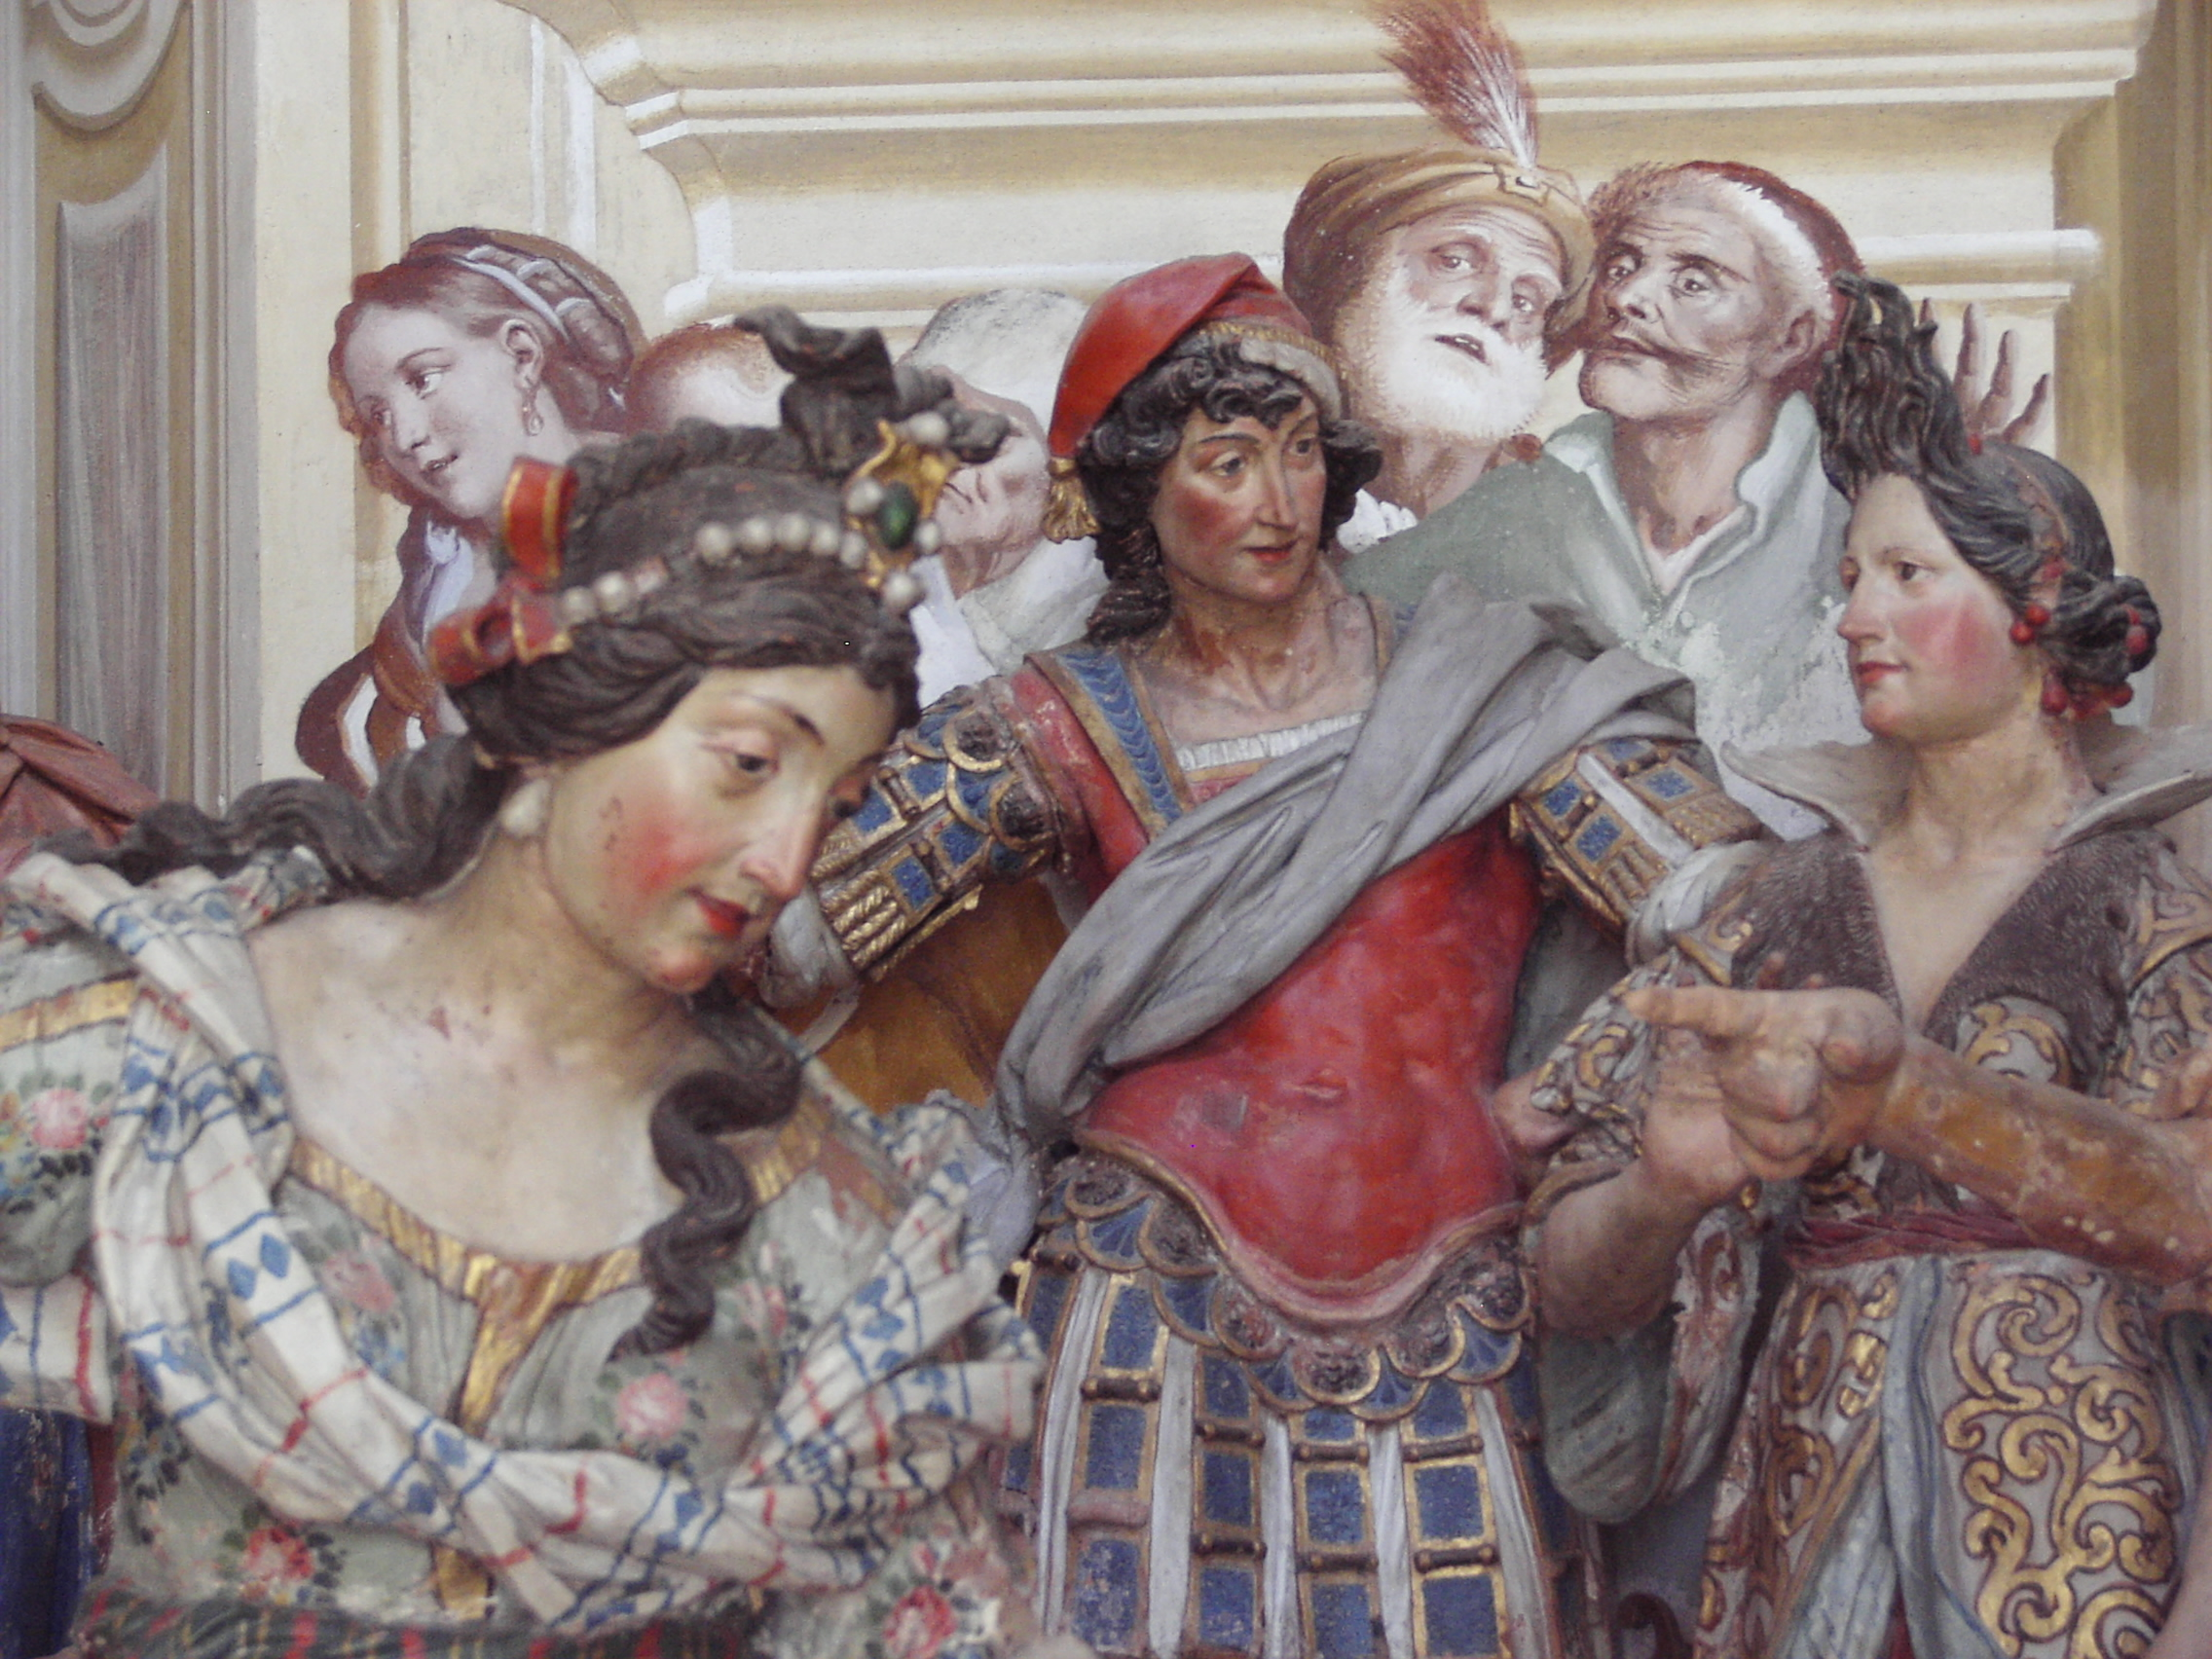 Orta – Sacro Monte (11)